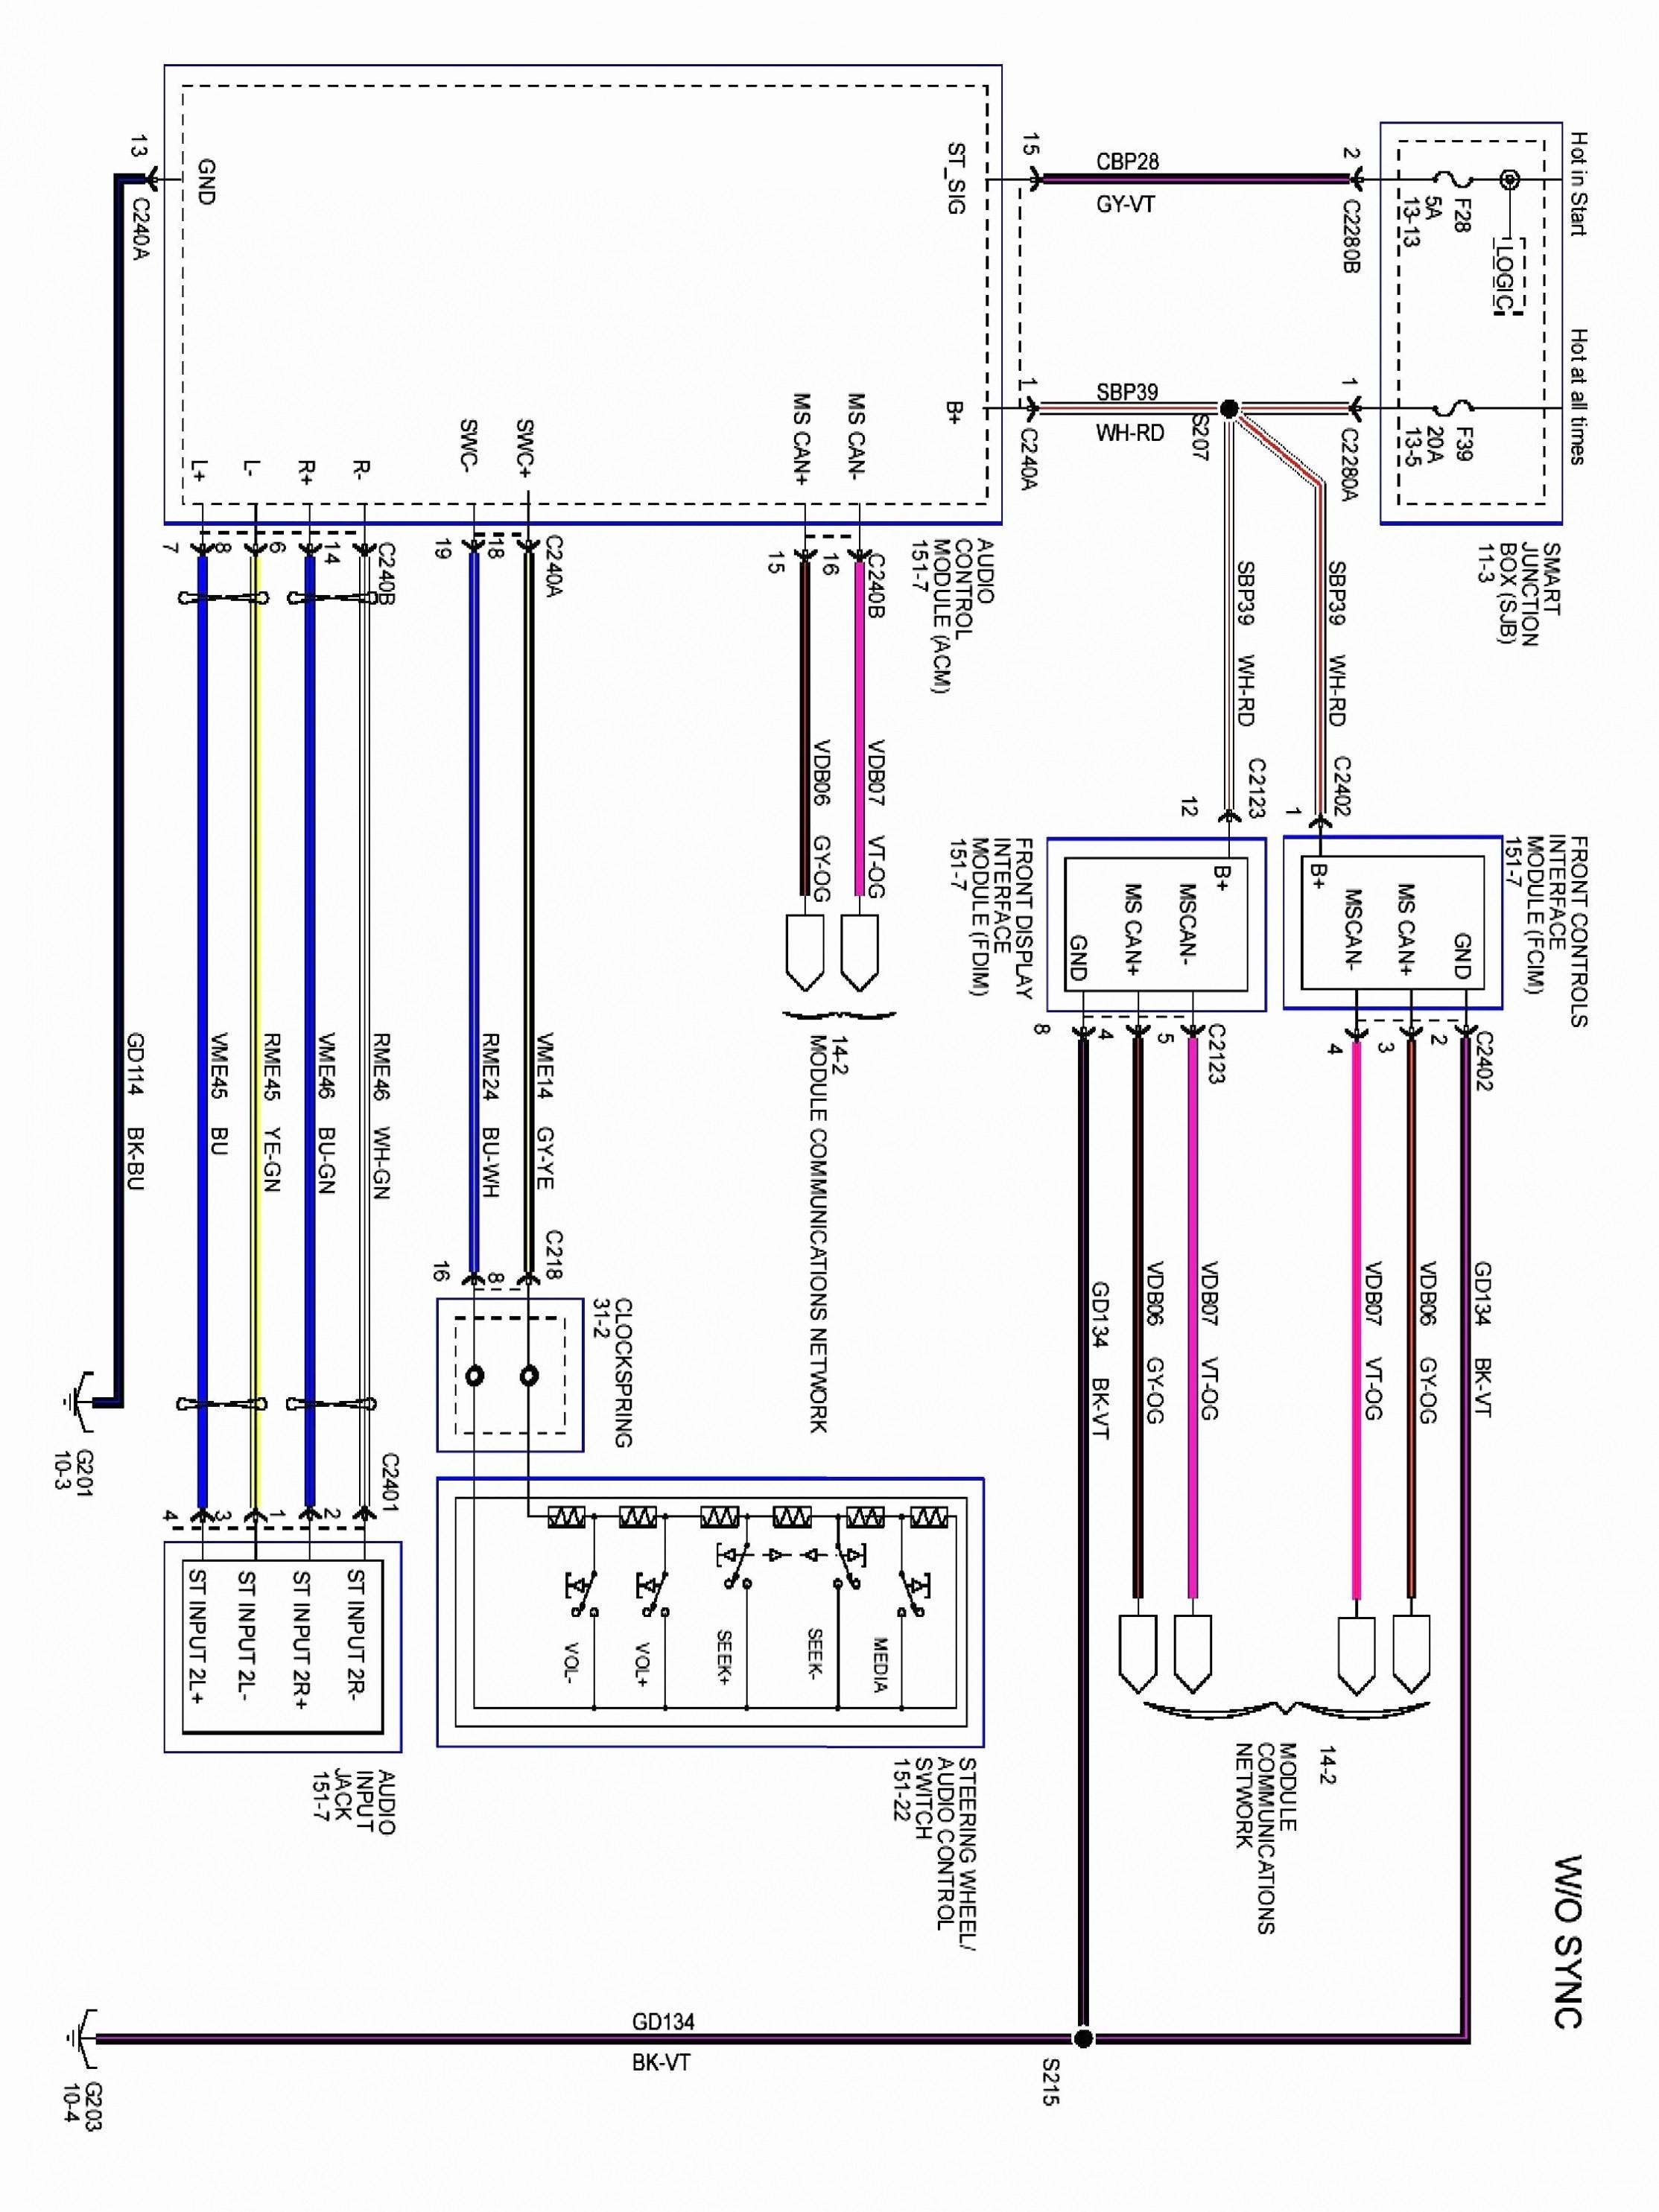 Dirt Bike Engine Diagram aspire Xc603g Wiring Diagram Another Blog About Wiring Diagram • Of Dirt Bike Engine Diagram